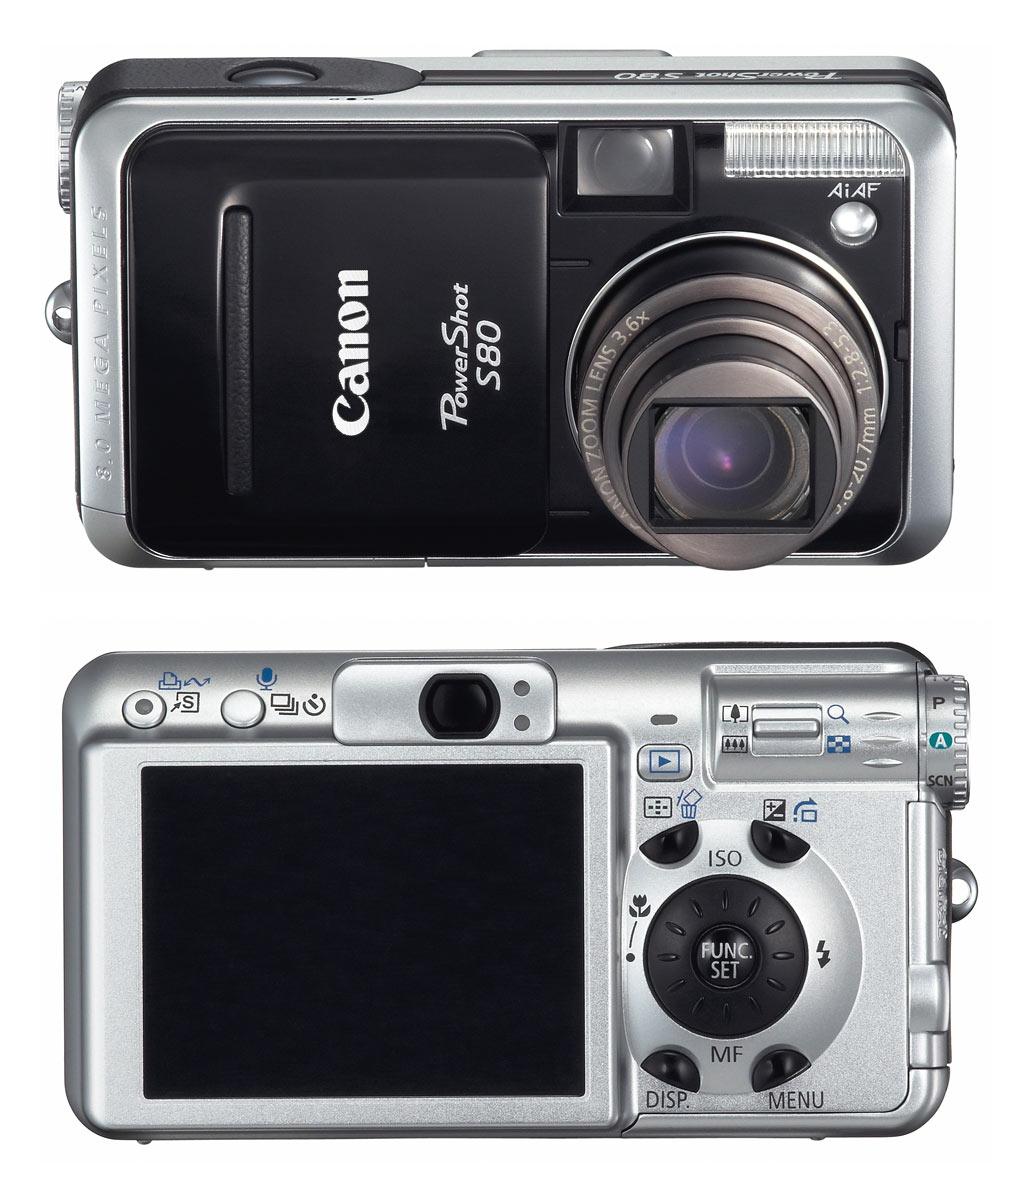 Canon PowerShot S80 Windows 8 X64